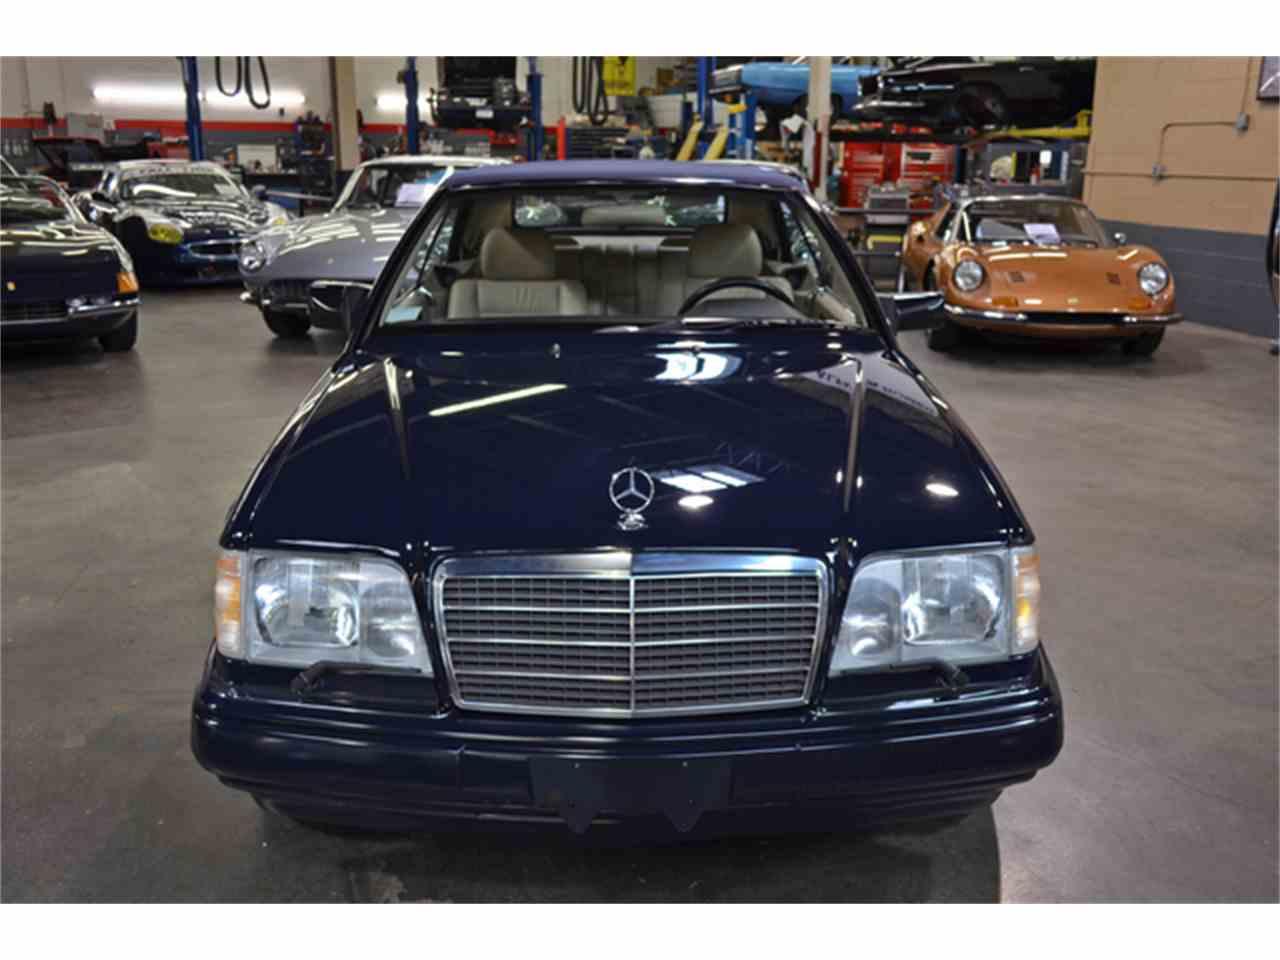 1995 mercedes benz e320 for sale cc for 1995 mercedes benz e320 for sale